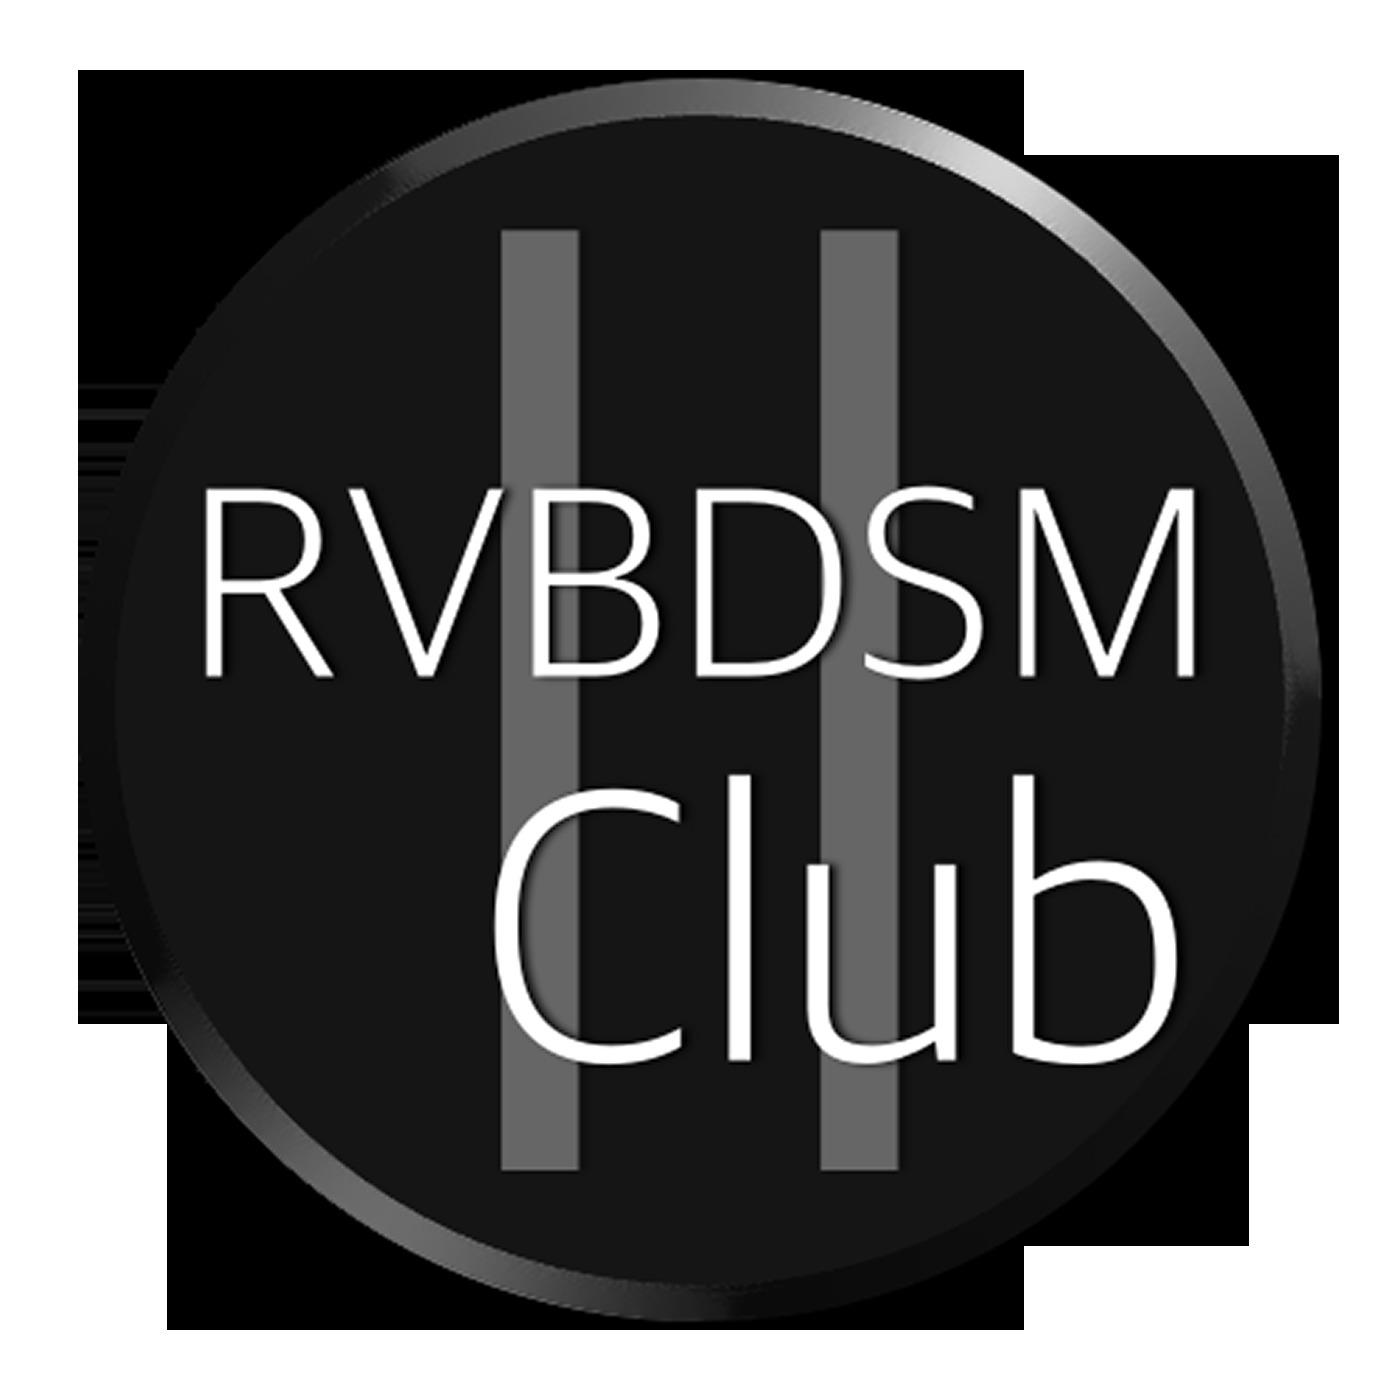 RVBDSM NEWS || Новости о БДСМ, фетиш и секс индустрии